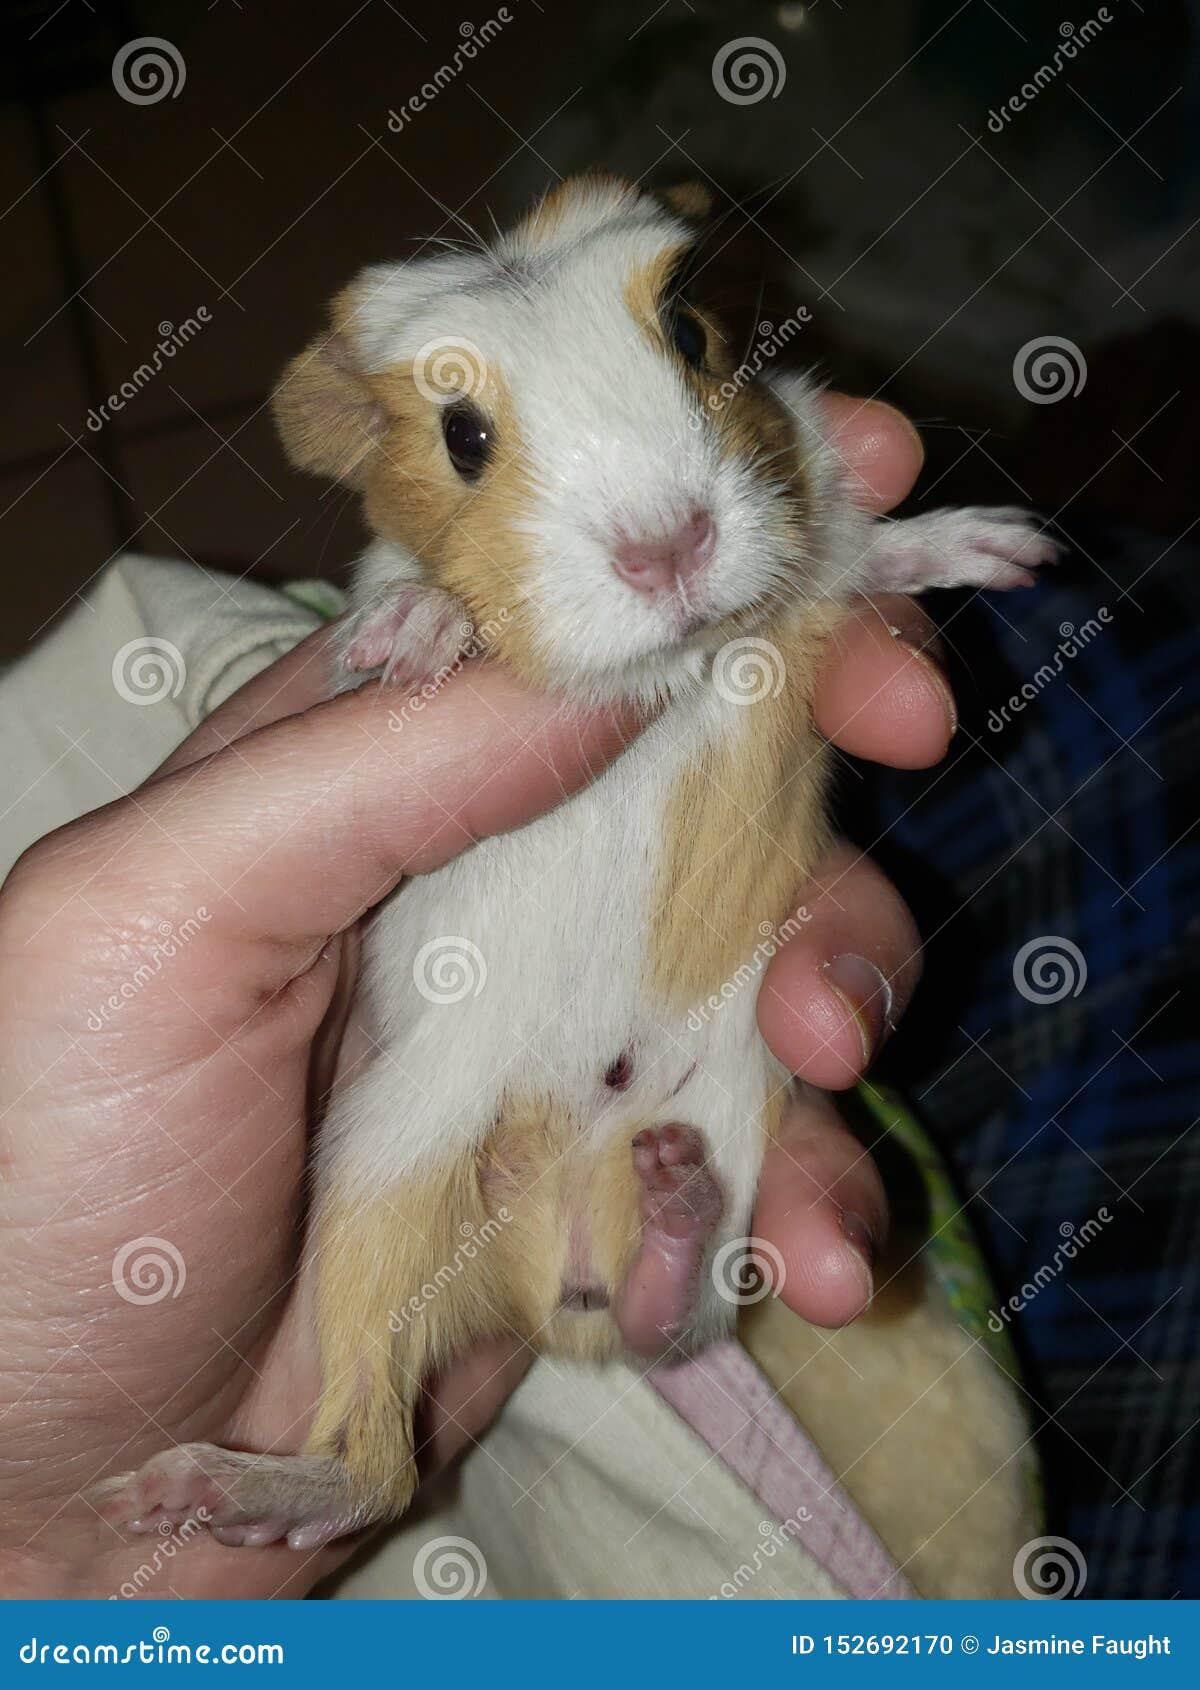 American baby guinea pig